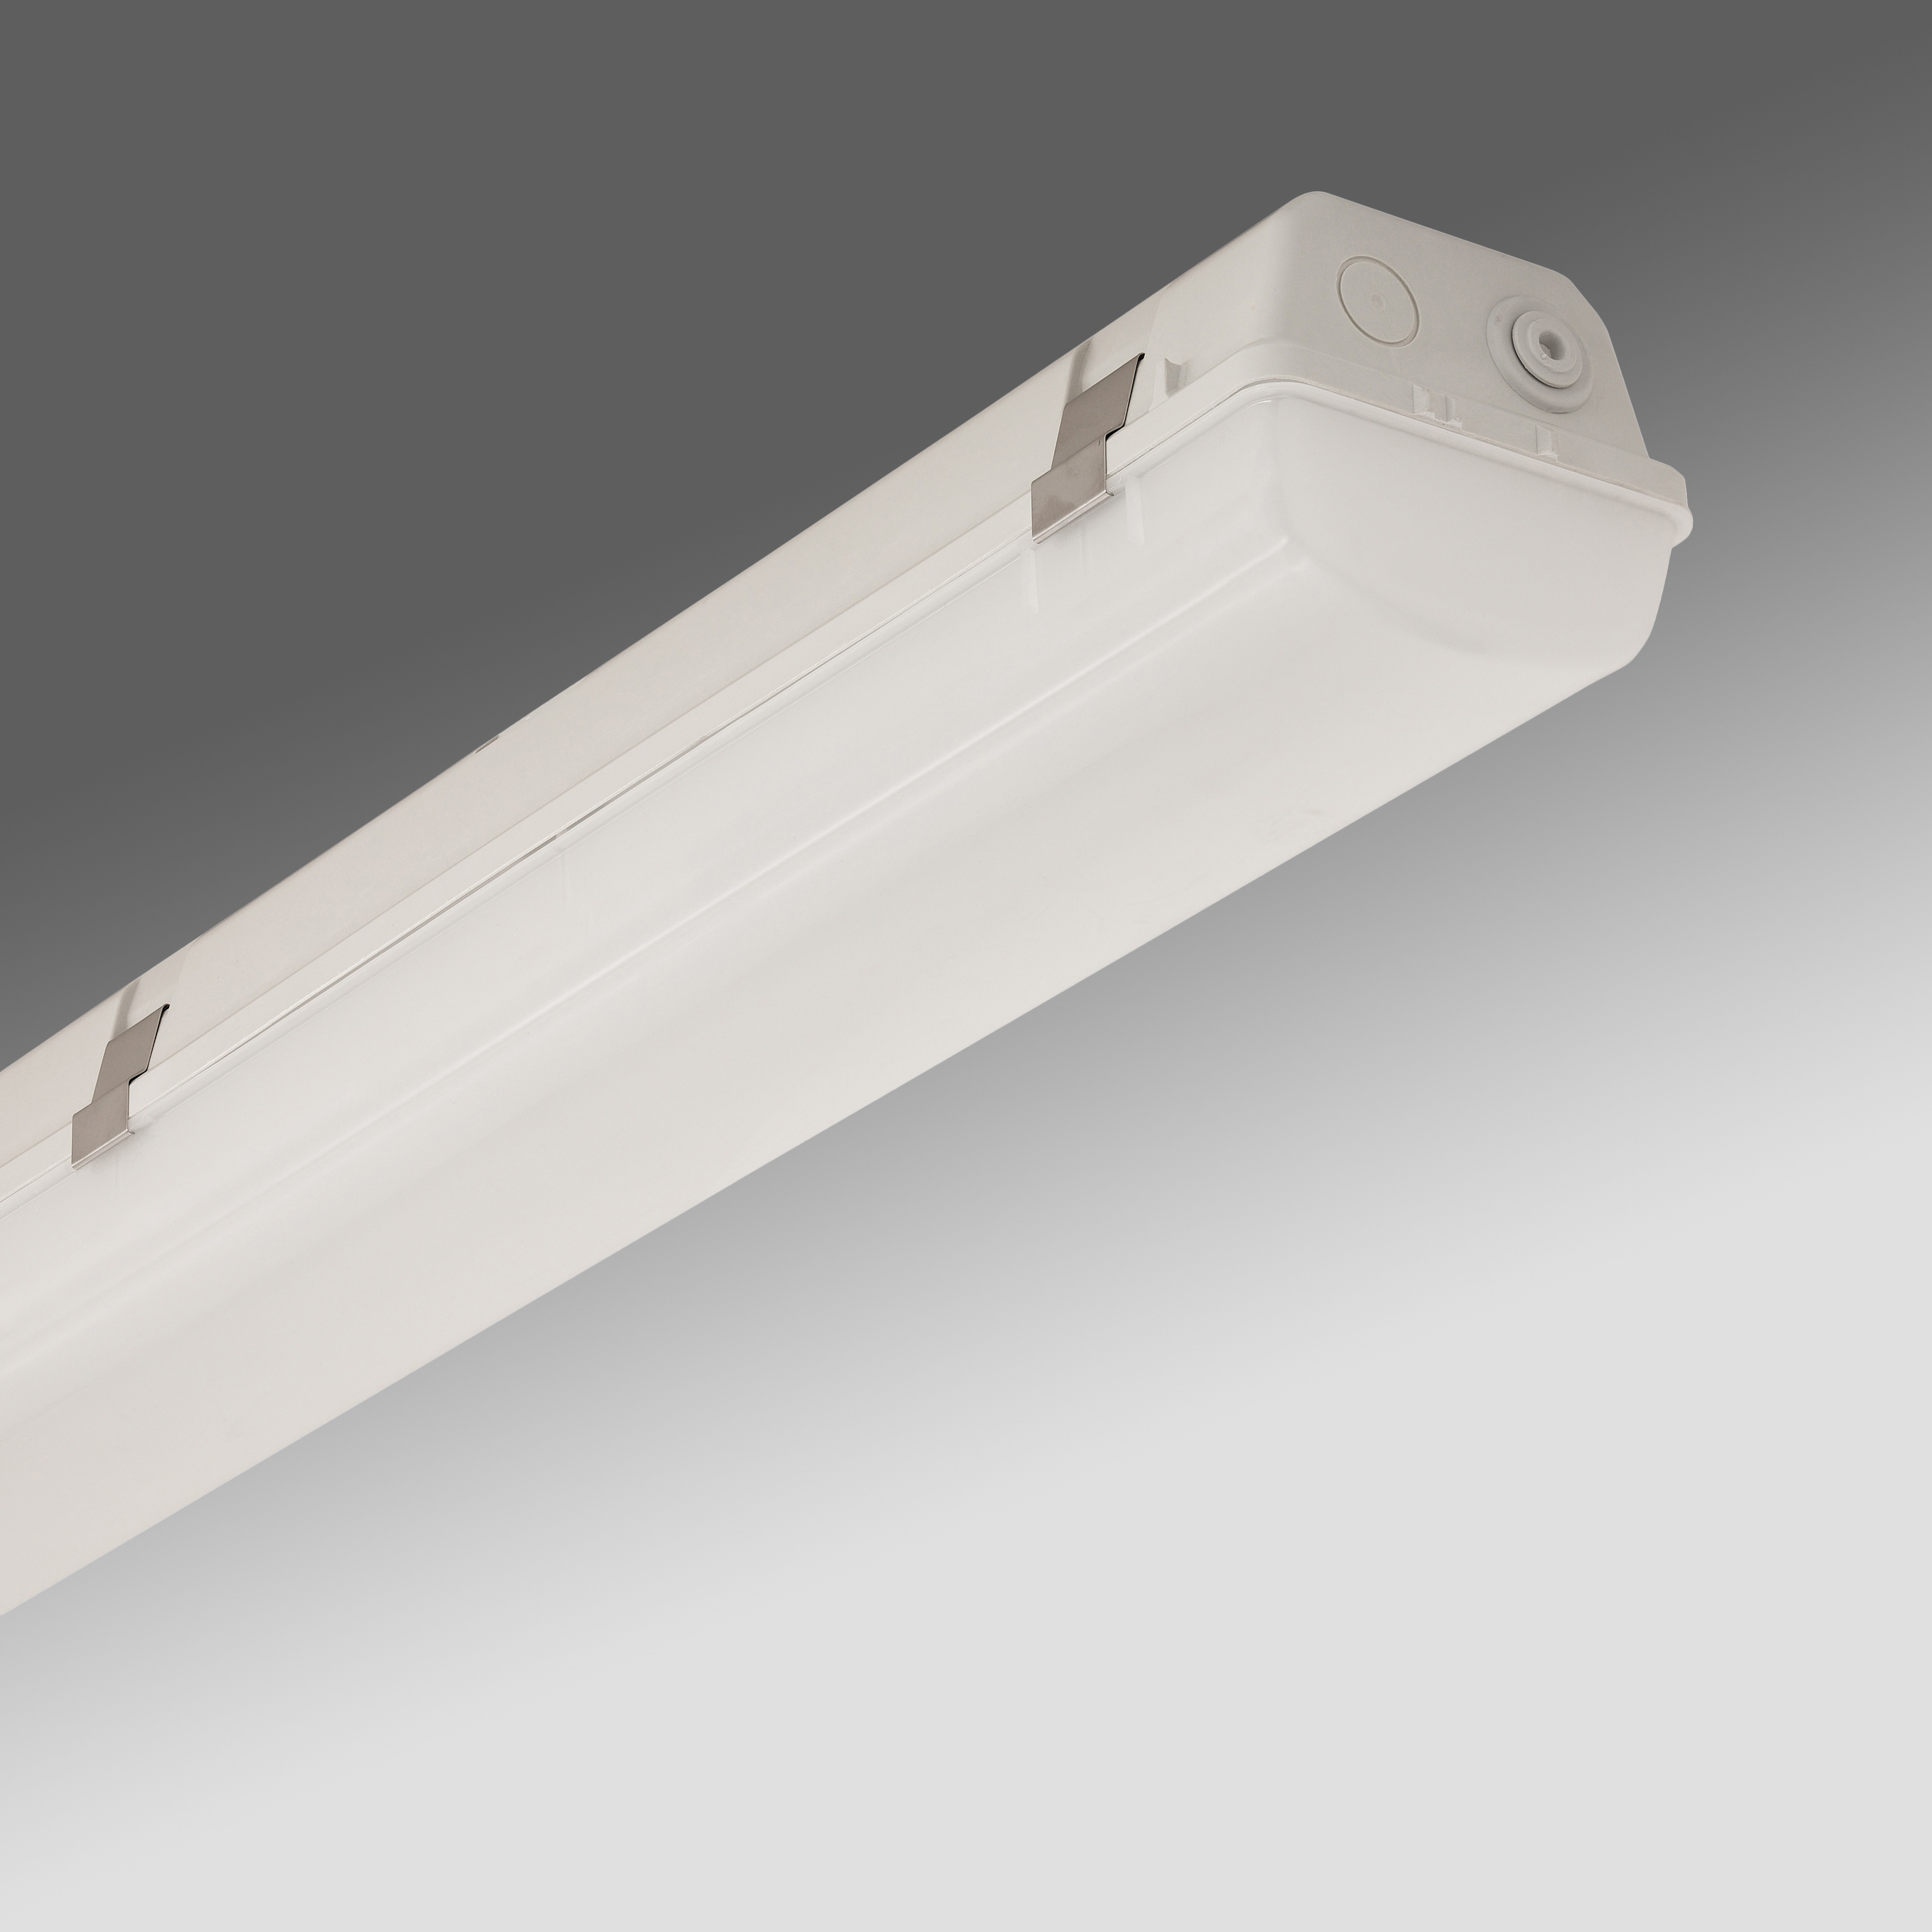 1 Stk Devo LED Pro 59W 840 8100lm 230V EVG IP65 SK I PMMA 1200mm LIVB0004--